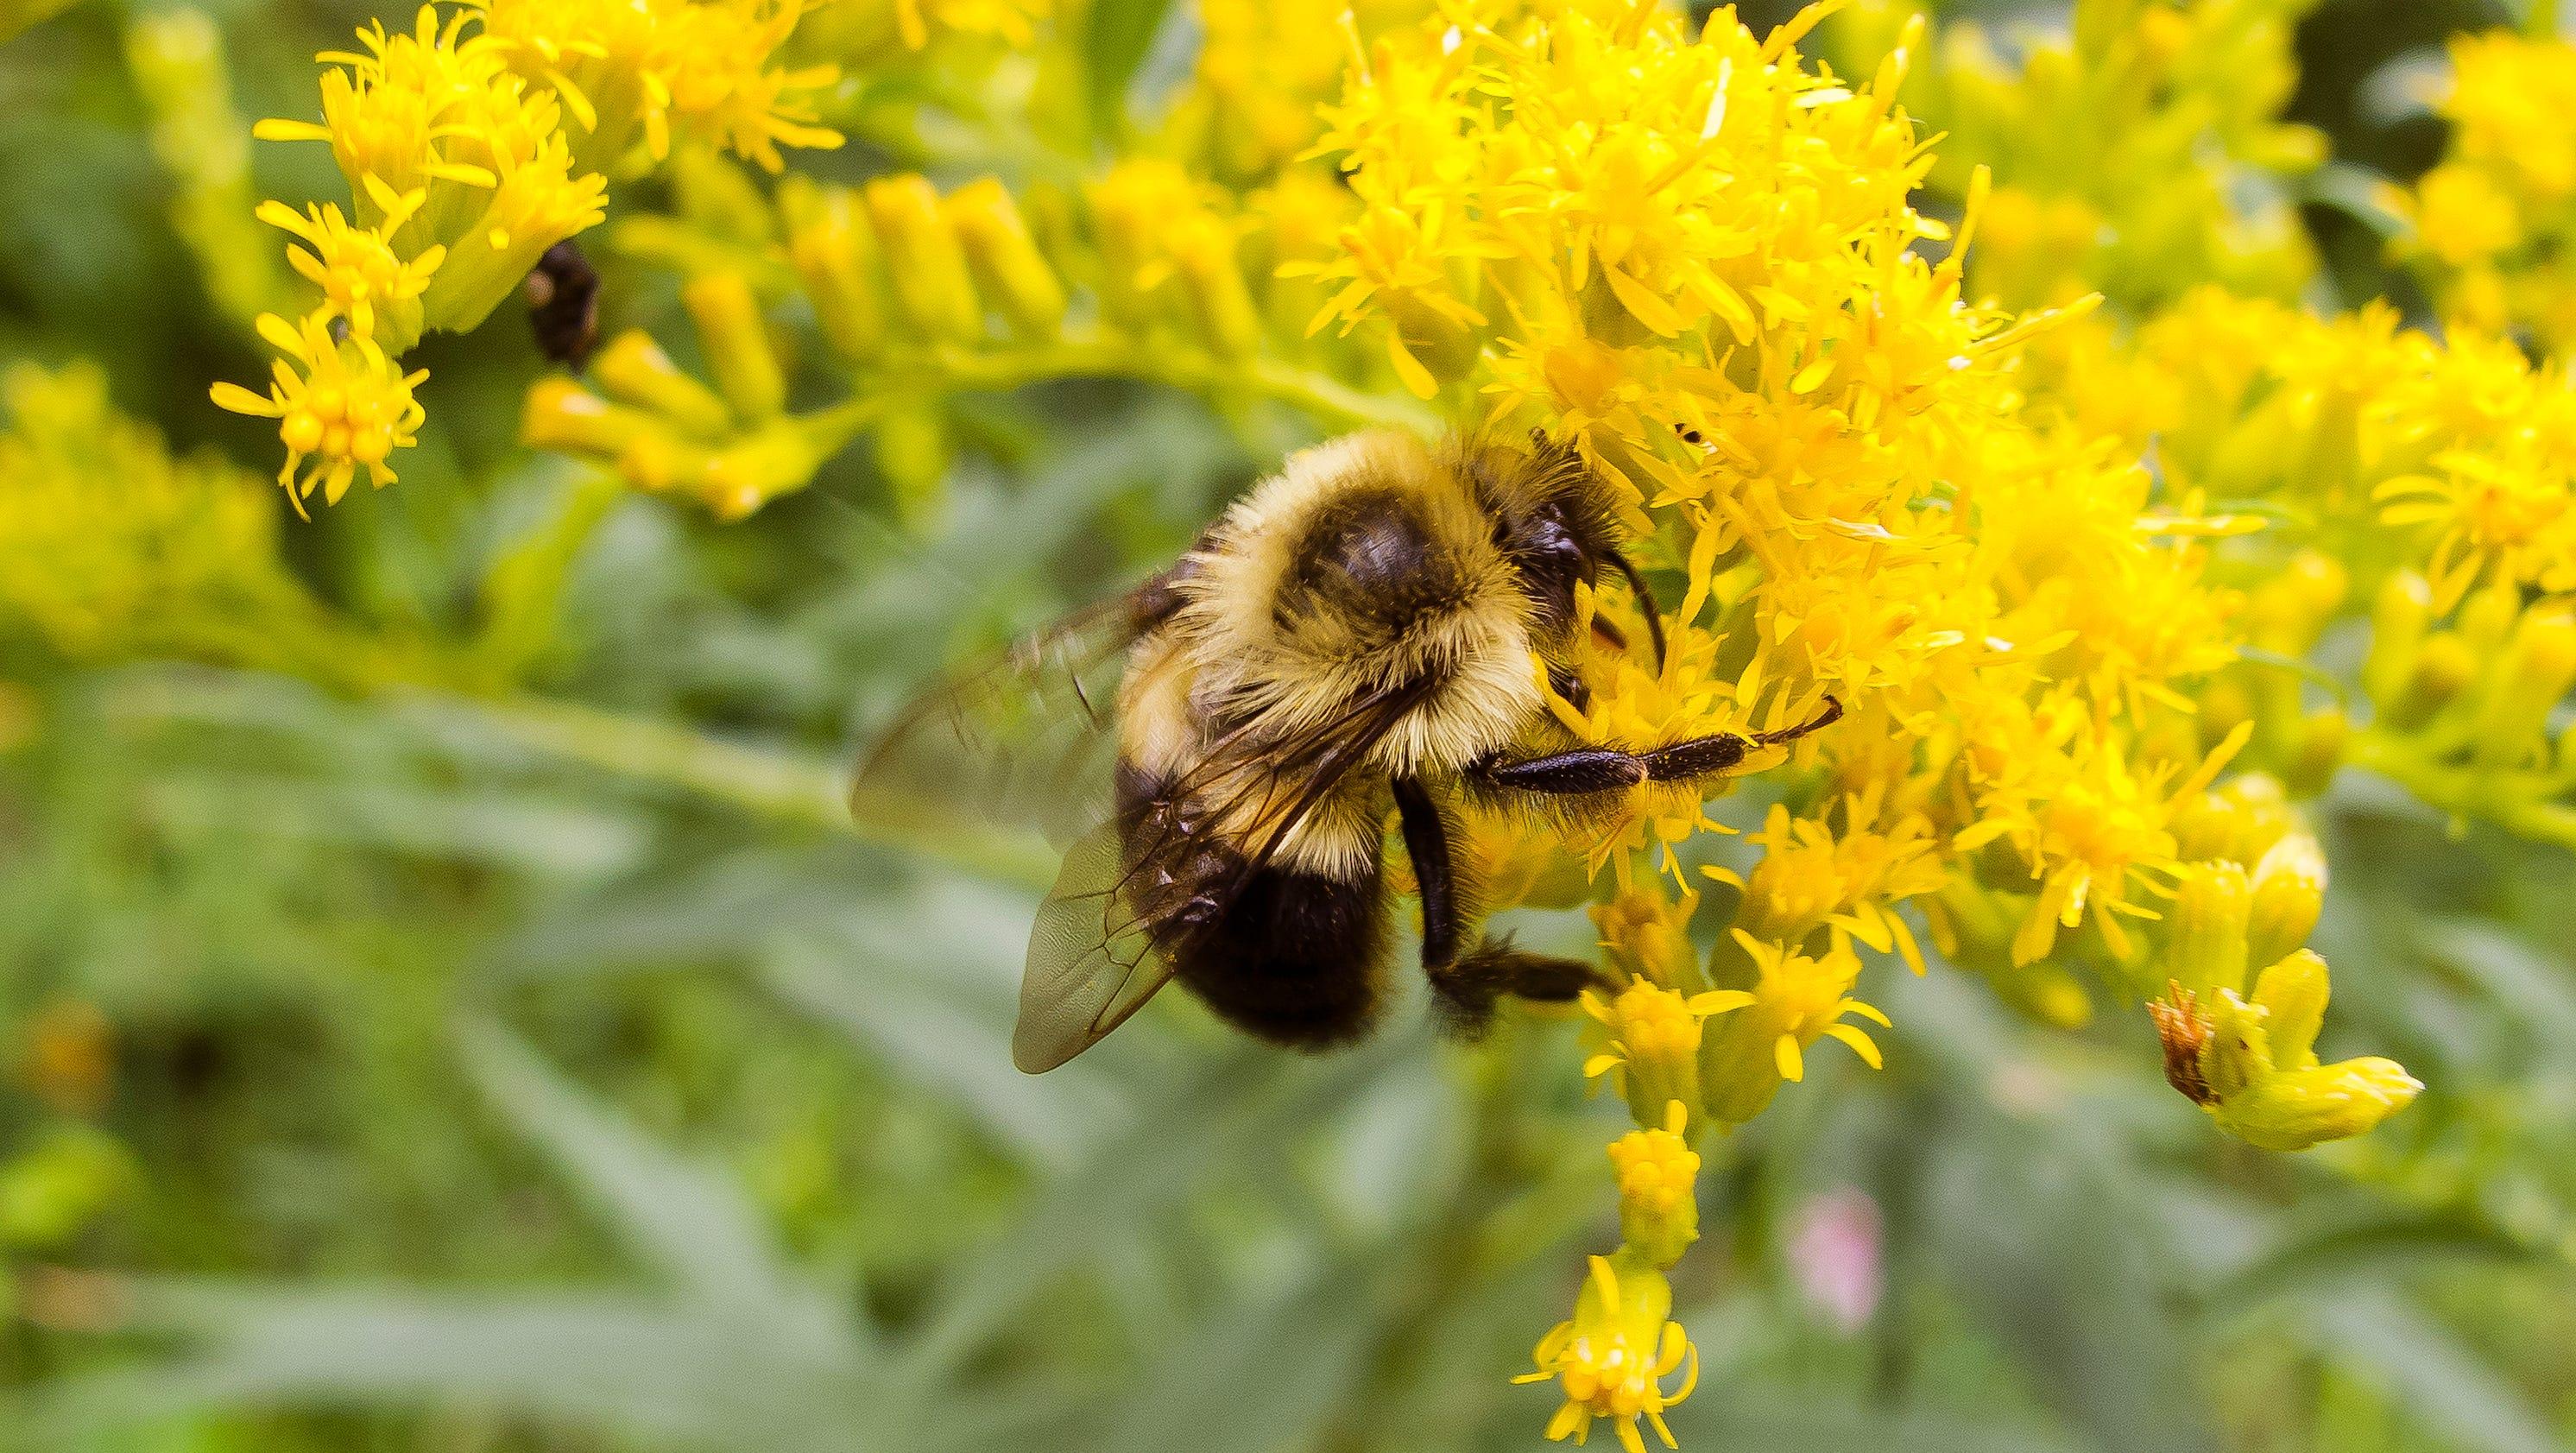 a bumblebee vanishes